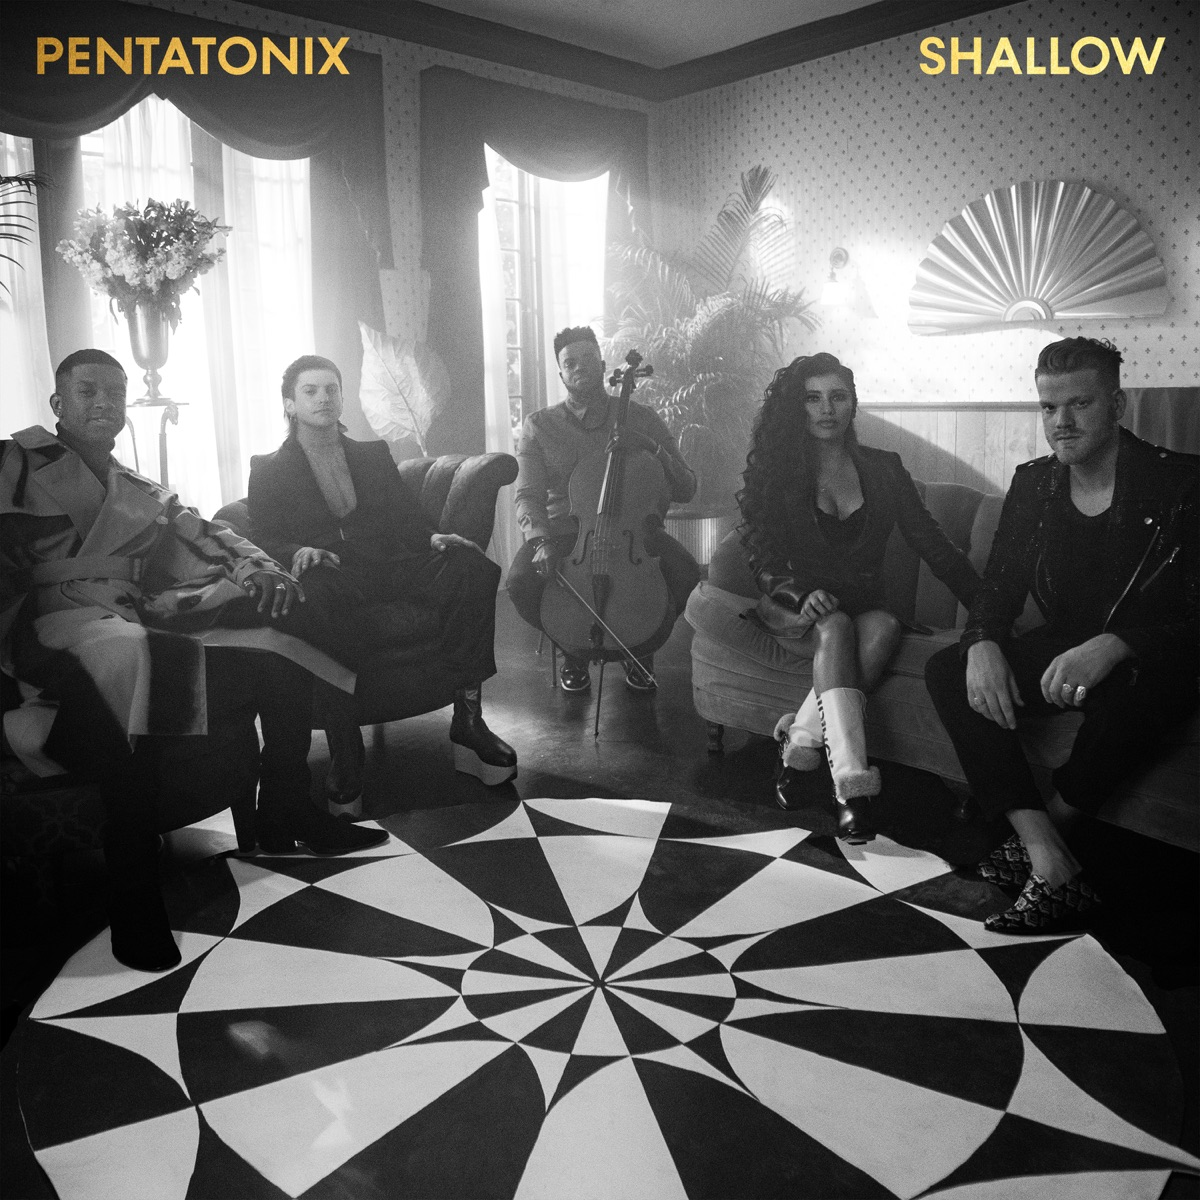 Pentatonix Christmas Cd 2019.Shallow Single Album Cover By Pentatonix